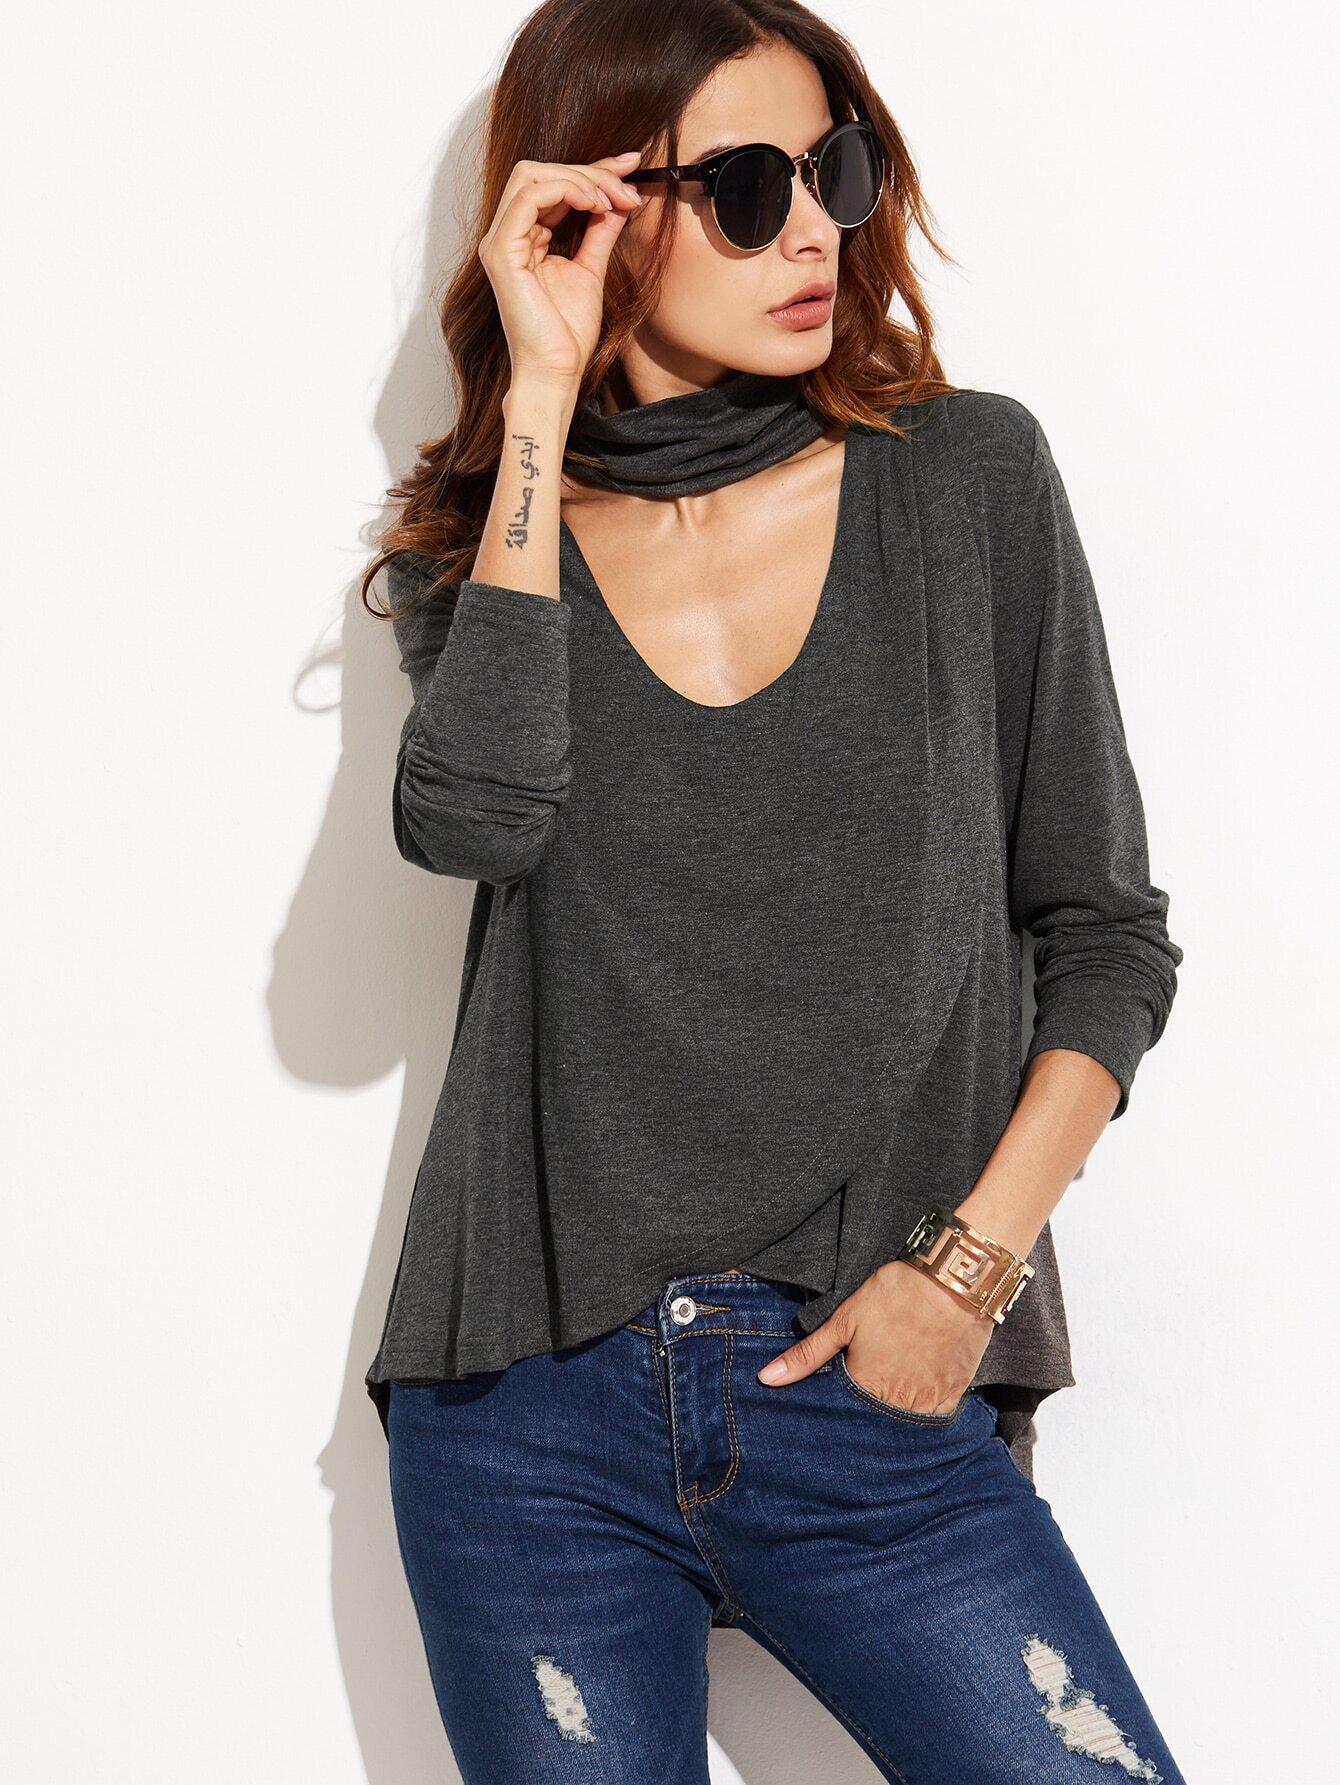 919b2b0cee4 Heather Grey Choker Neck Overlap T-shirt EmmaCloth-Women Fast ...